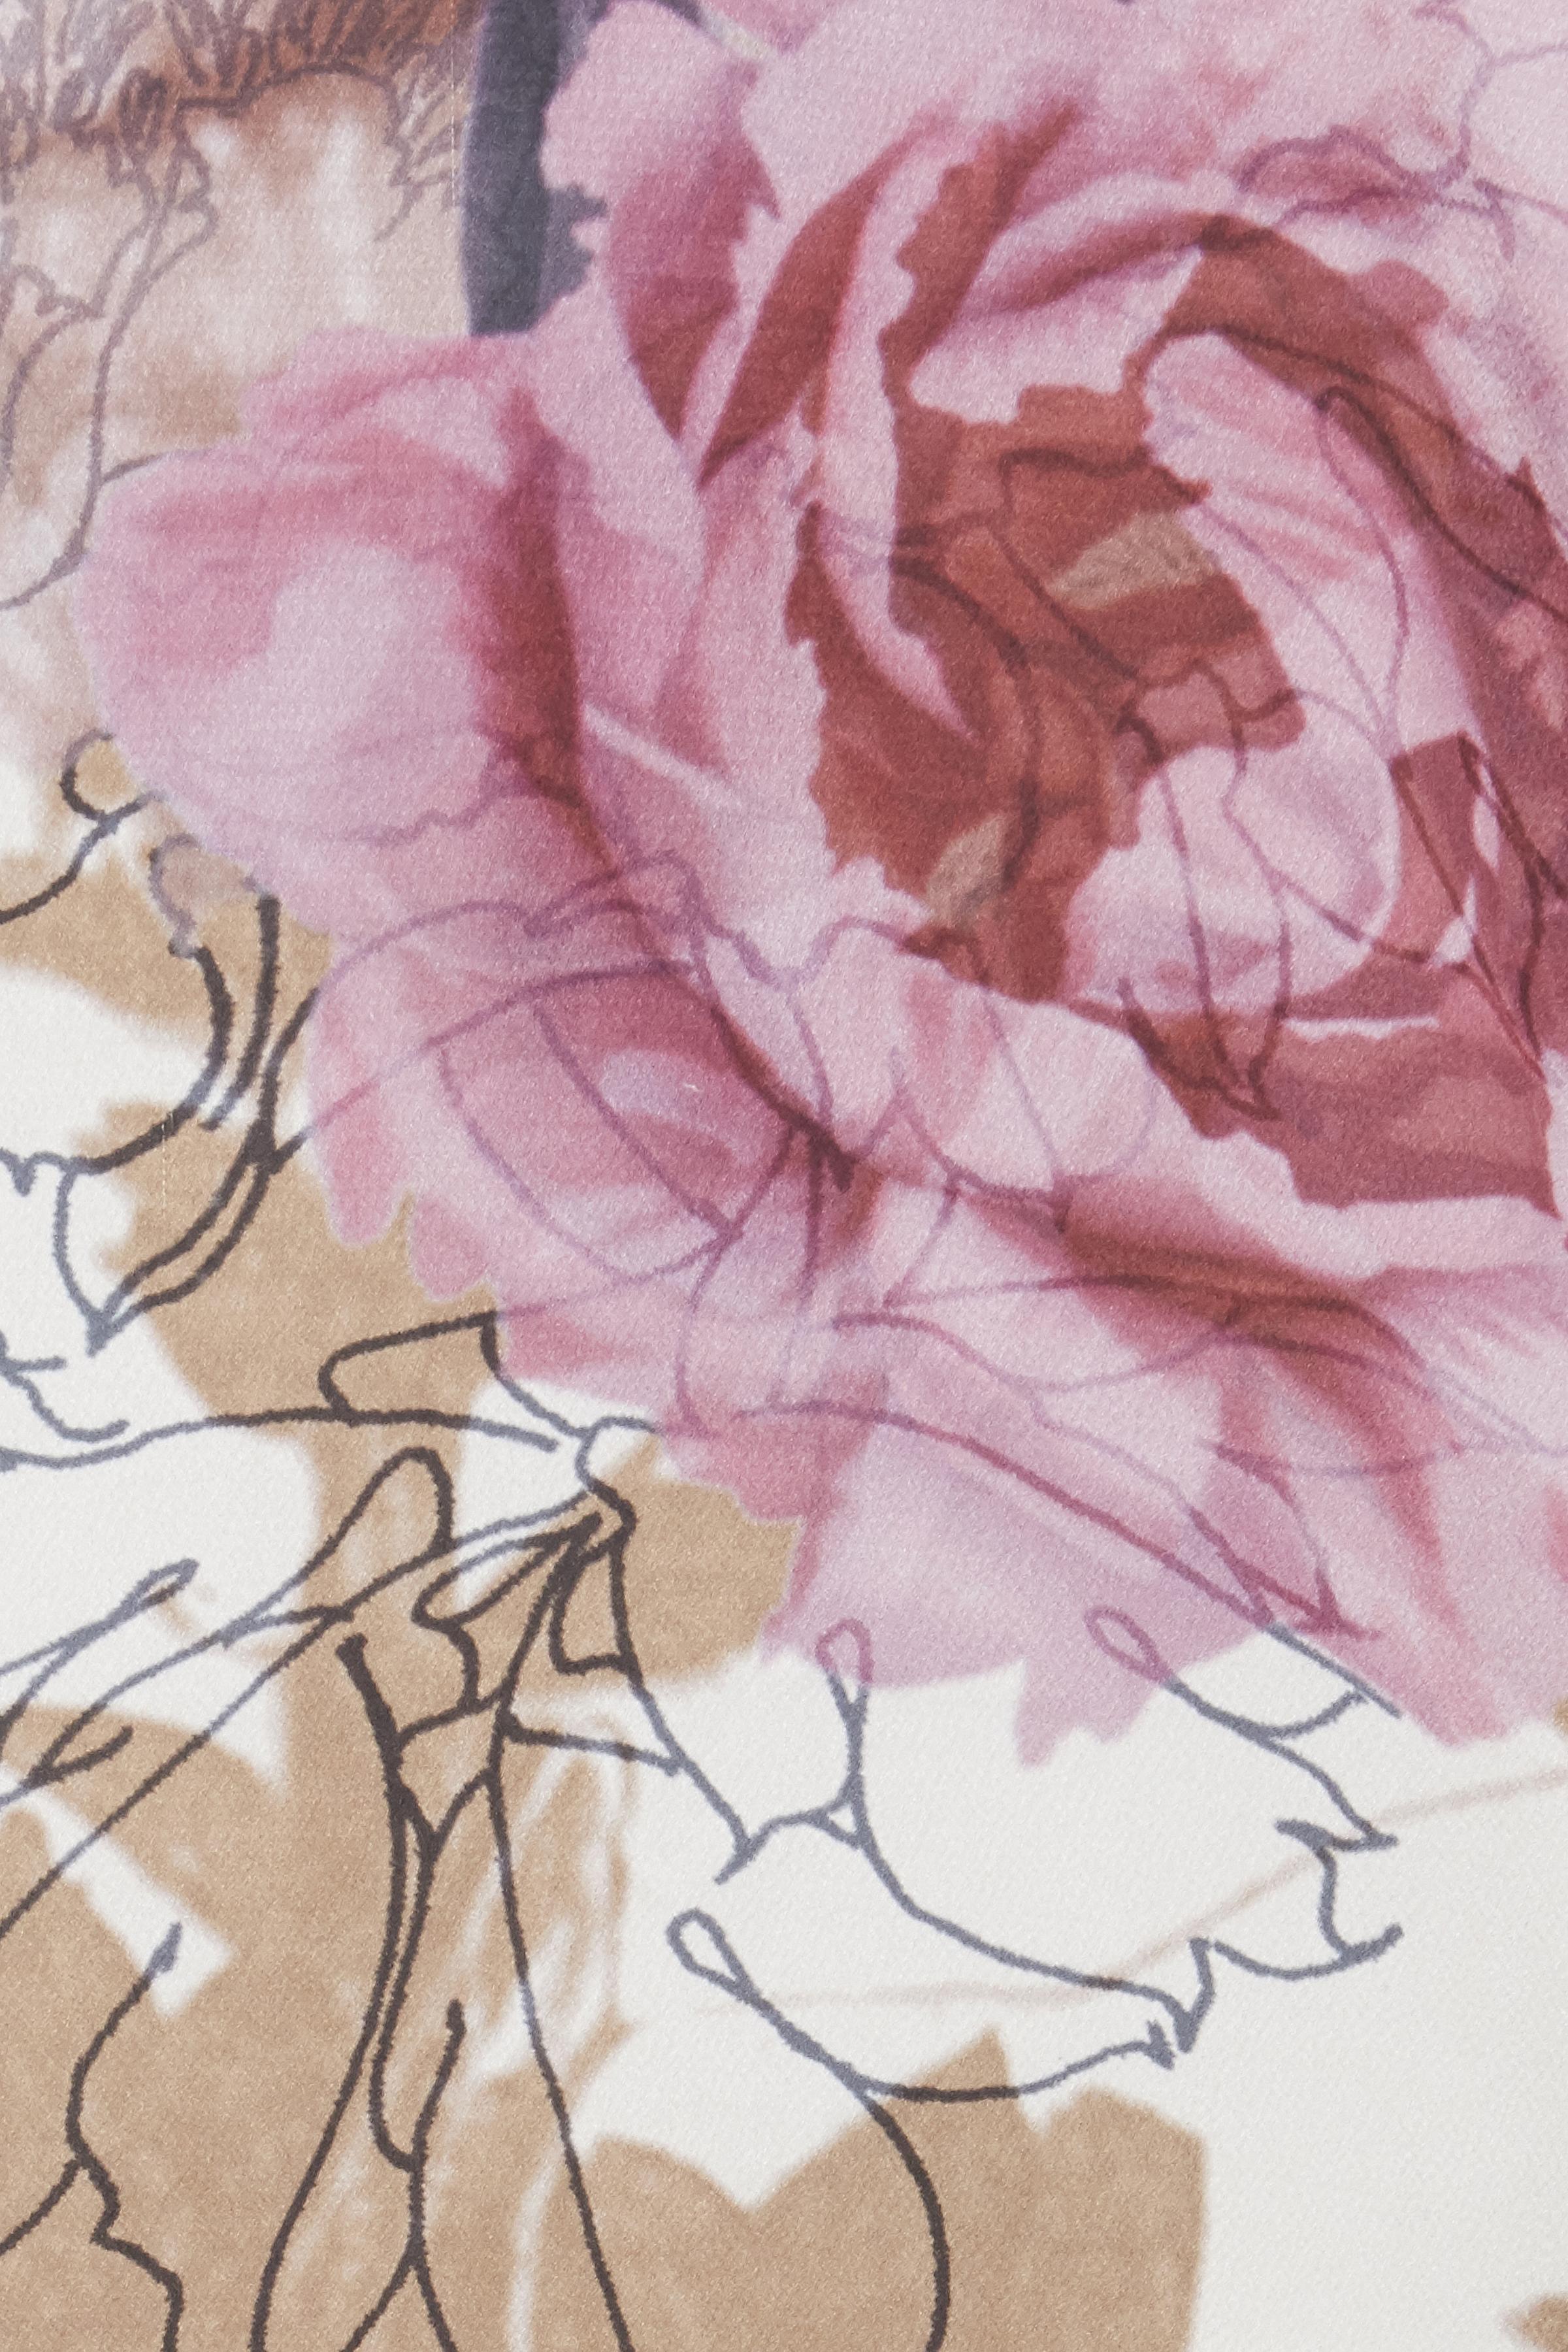 Wollweiß/rosa Kurzarm-Bluse von Fransa – Shoppen Sie Wollweiß/rosa Kurzarm-Bluse ab Gr. XS-XXL hier